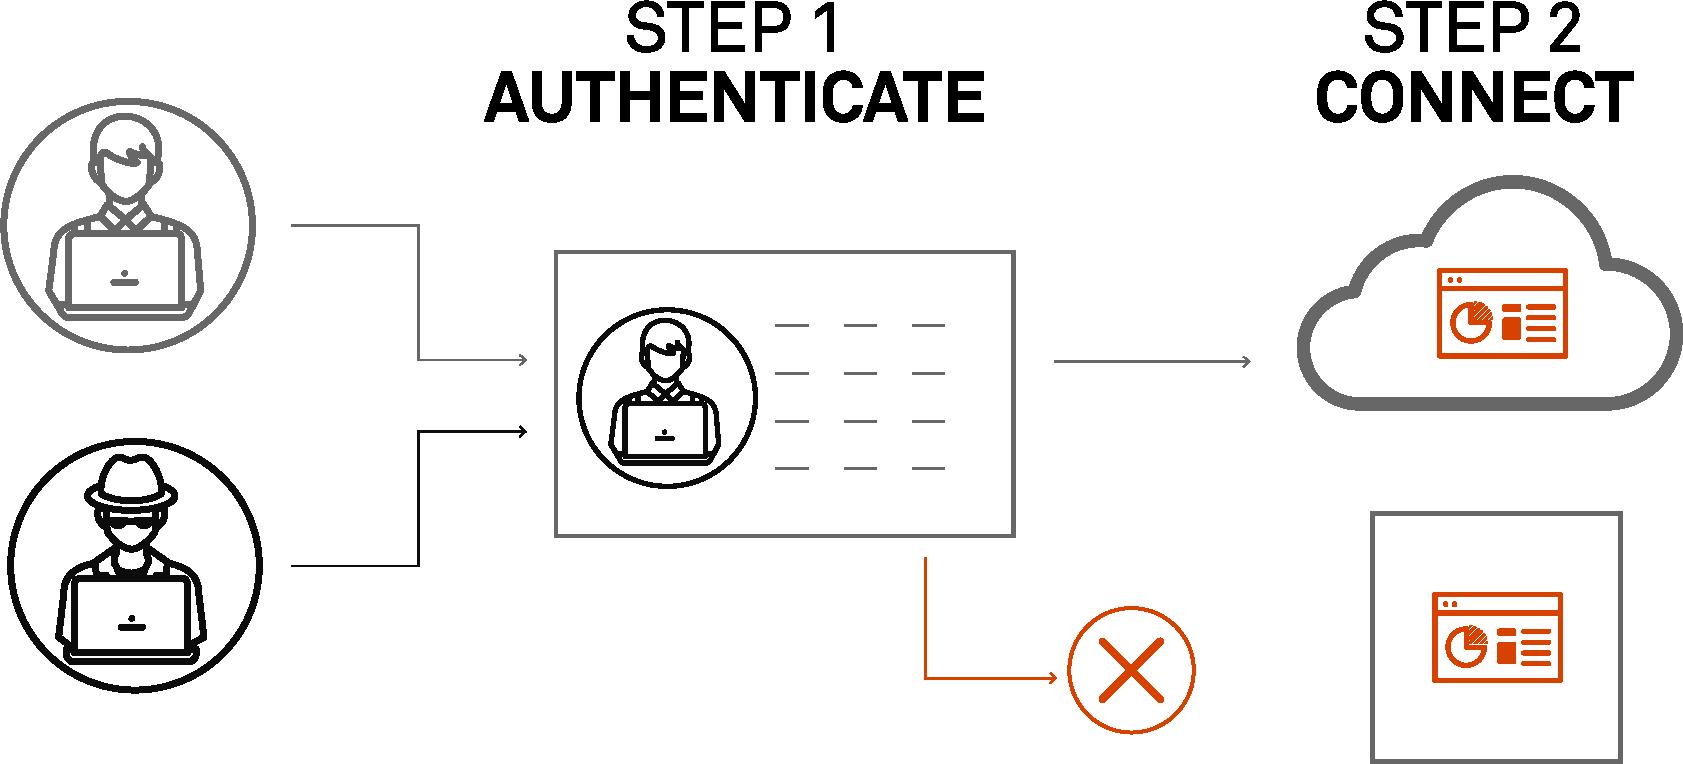 Software-Defined Perimeter - Software Defined Perimeter – What is Software Defined Perimeter – Software Defined Perimeter Vendors - Software Defined Perimeter Market